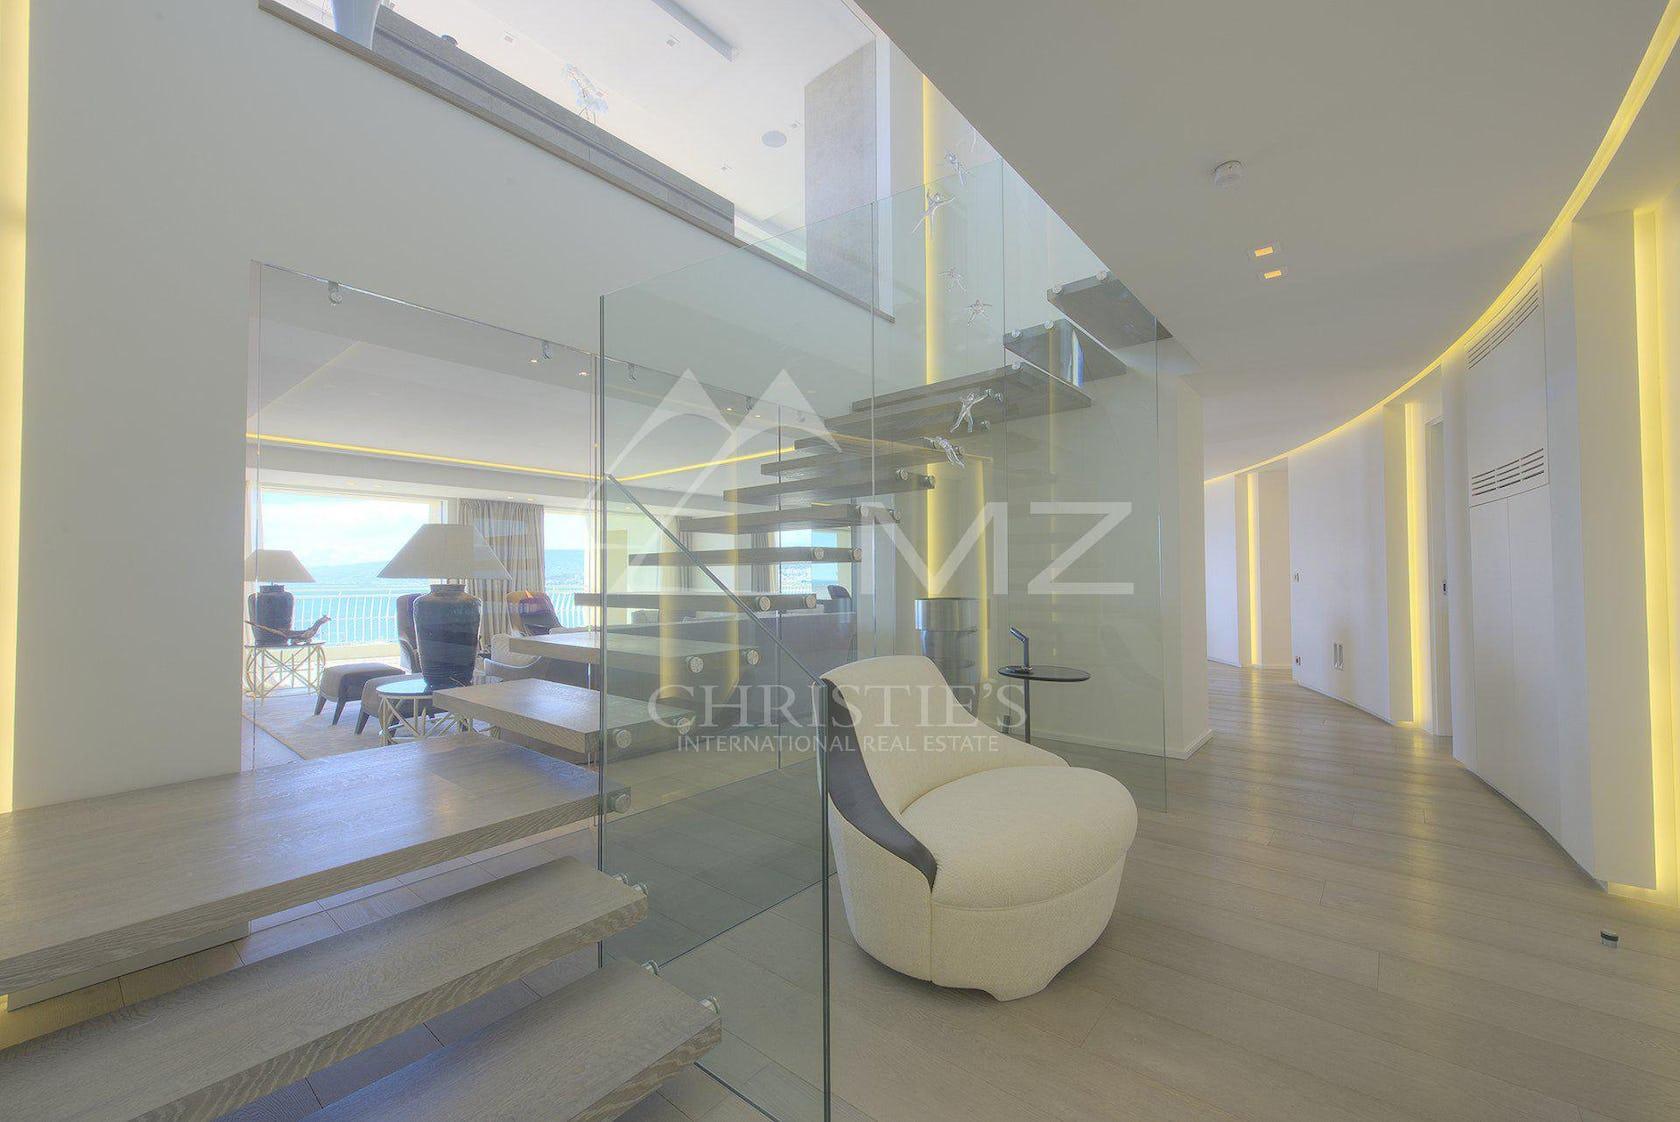 furniture flooring housing building indoors room floor living room interior design table